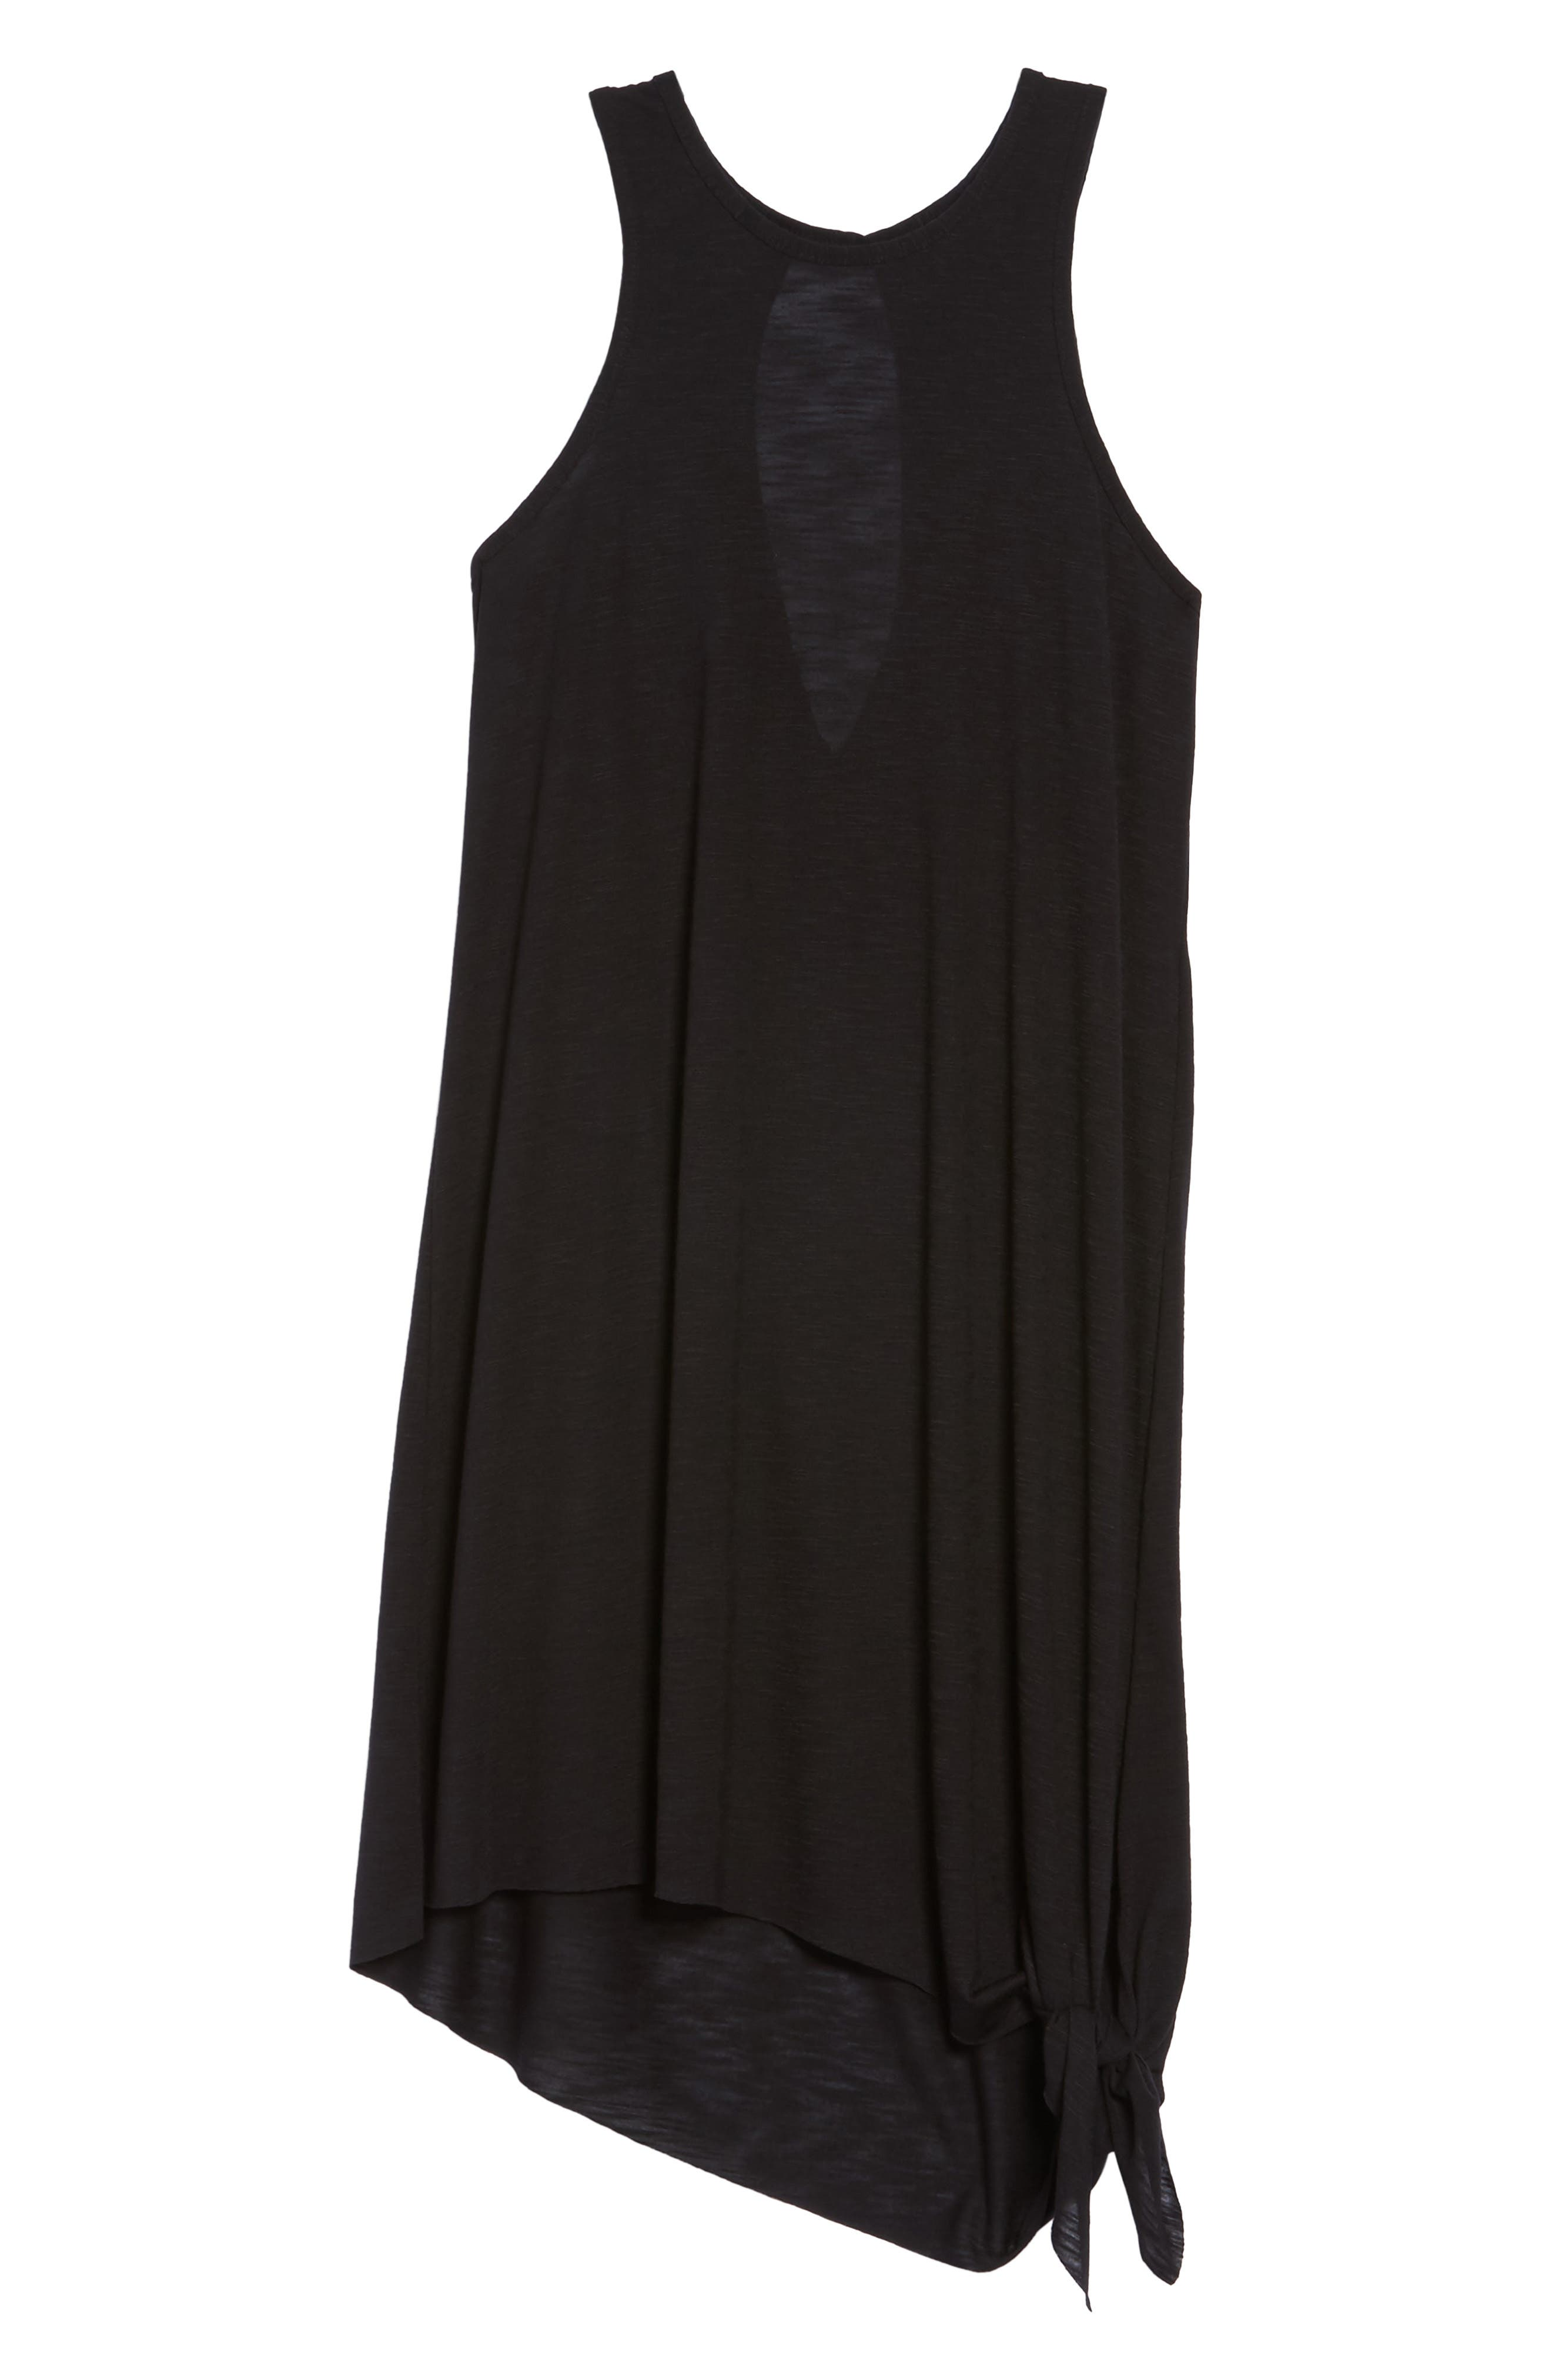 BECCA, Breezy Basics Cover-Up Dress, Alternate thumbnail 7, color, BLACK